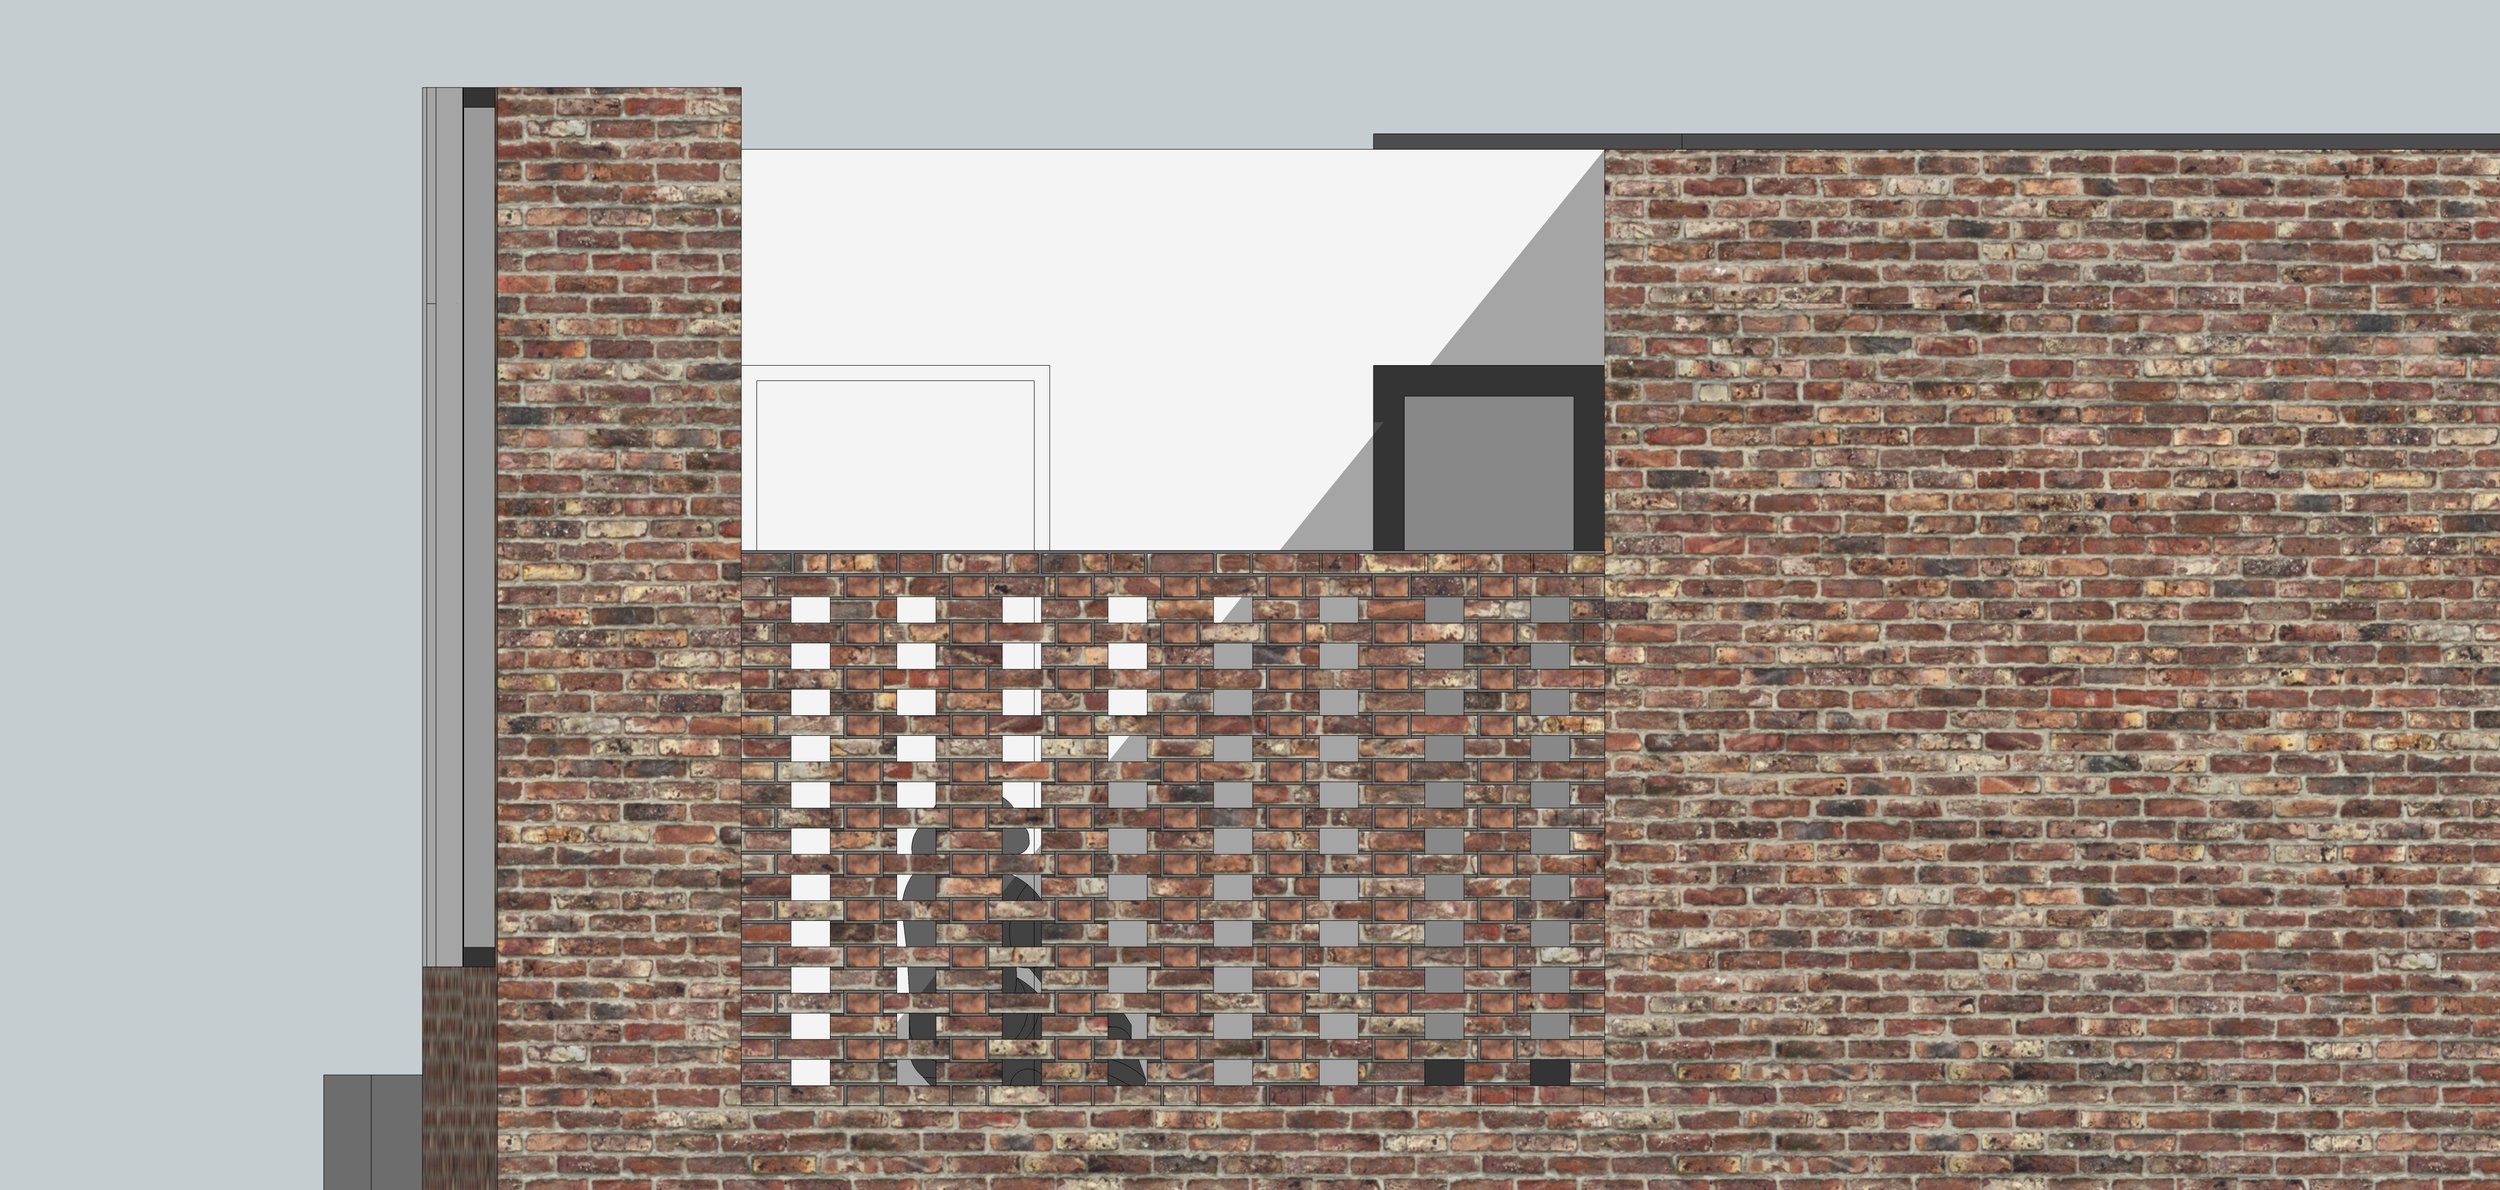 BRENNAN_FURLONG_MEWS_CLONTARF_Perforated_Brick.jpg